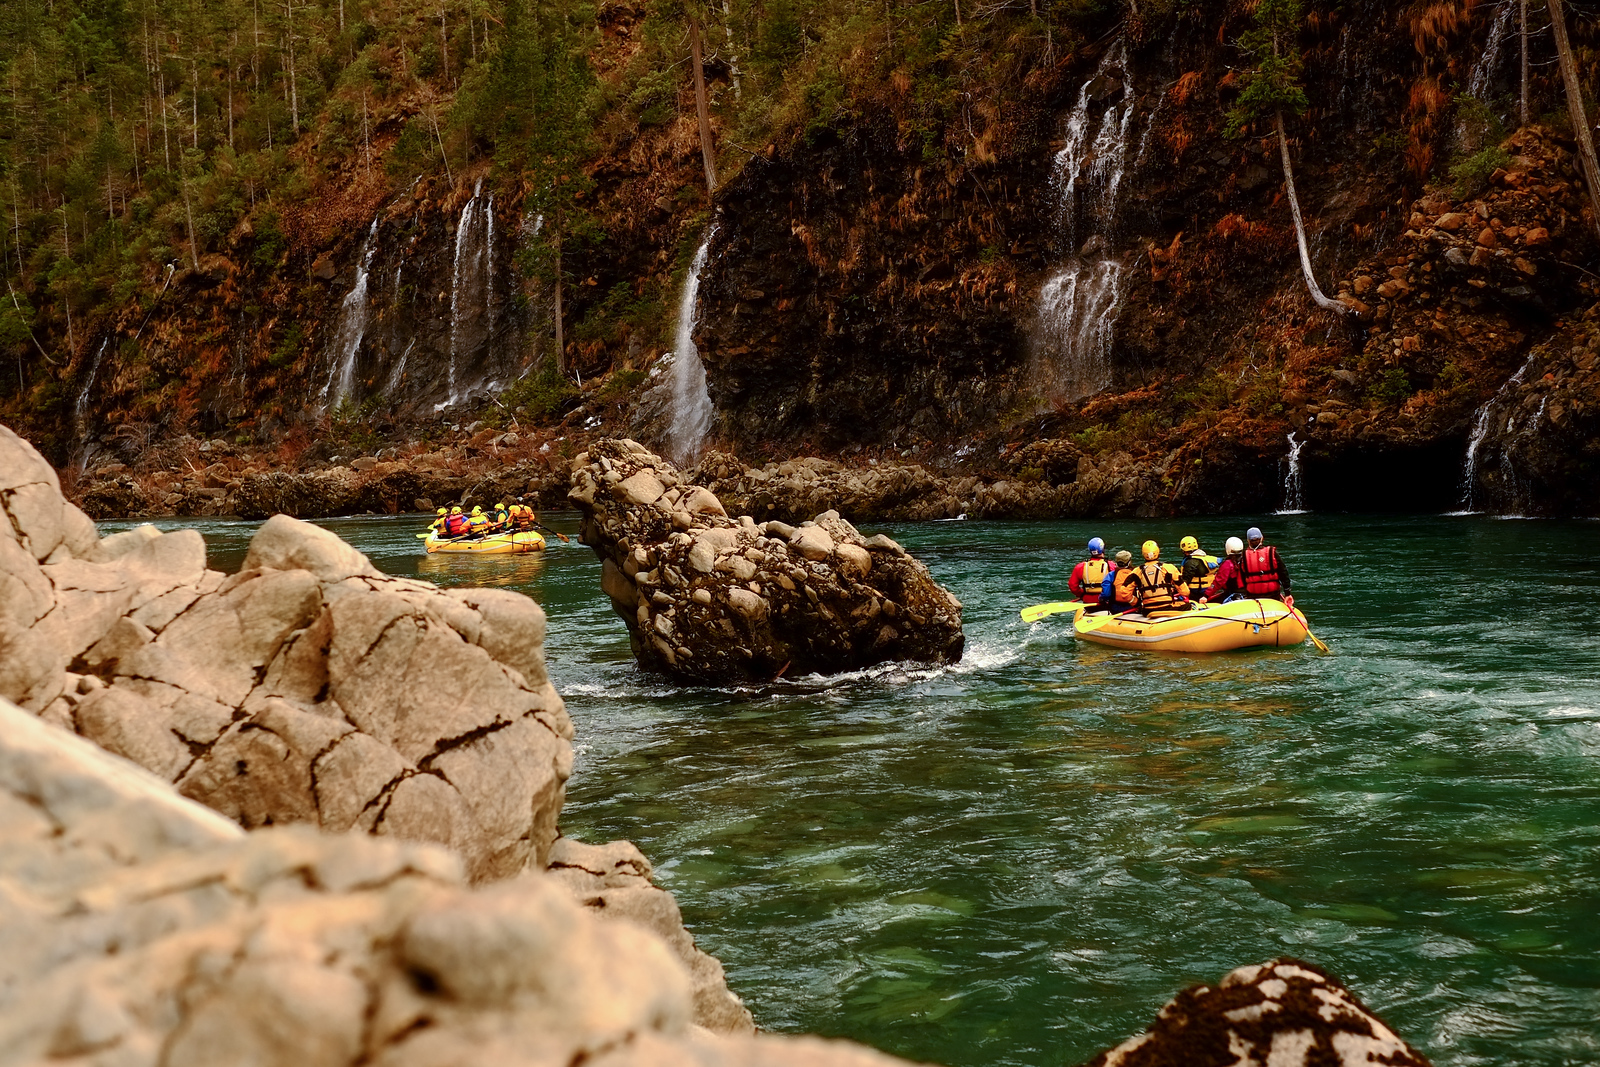 Indigo Creek - North Fork Smith